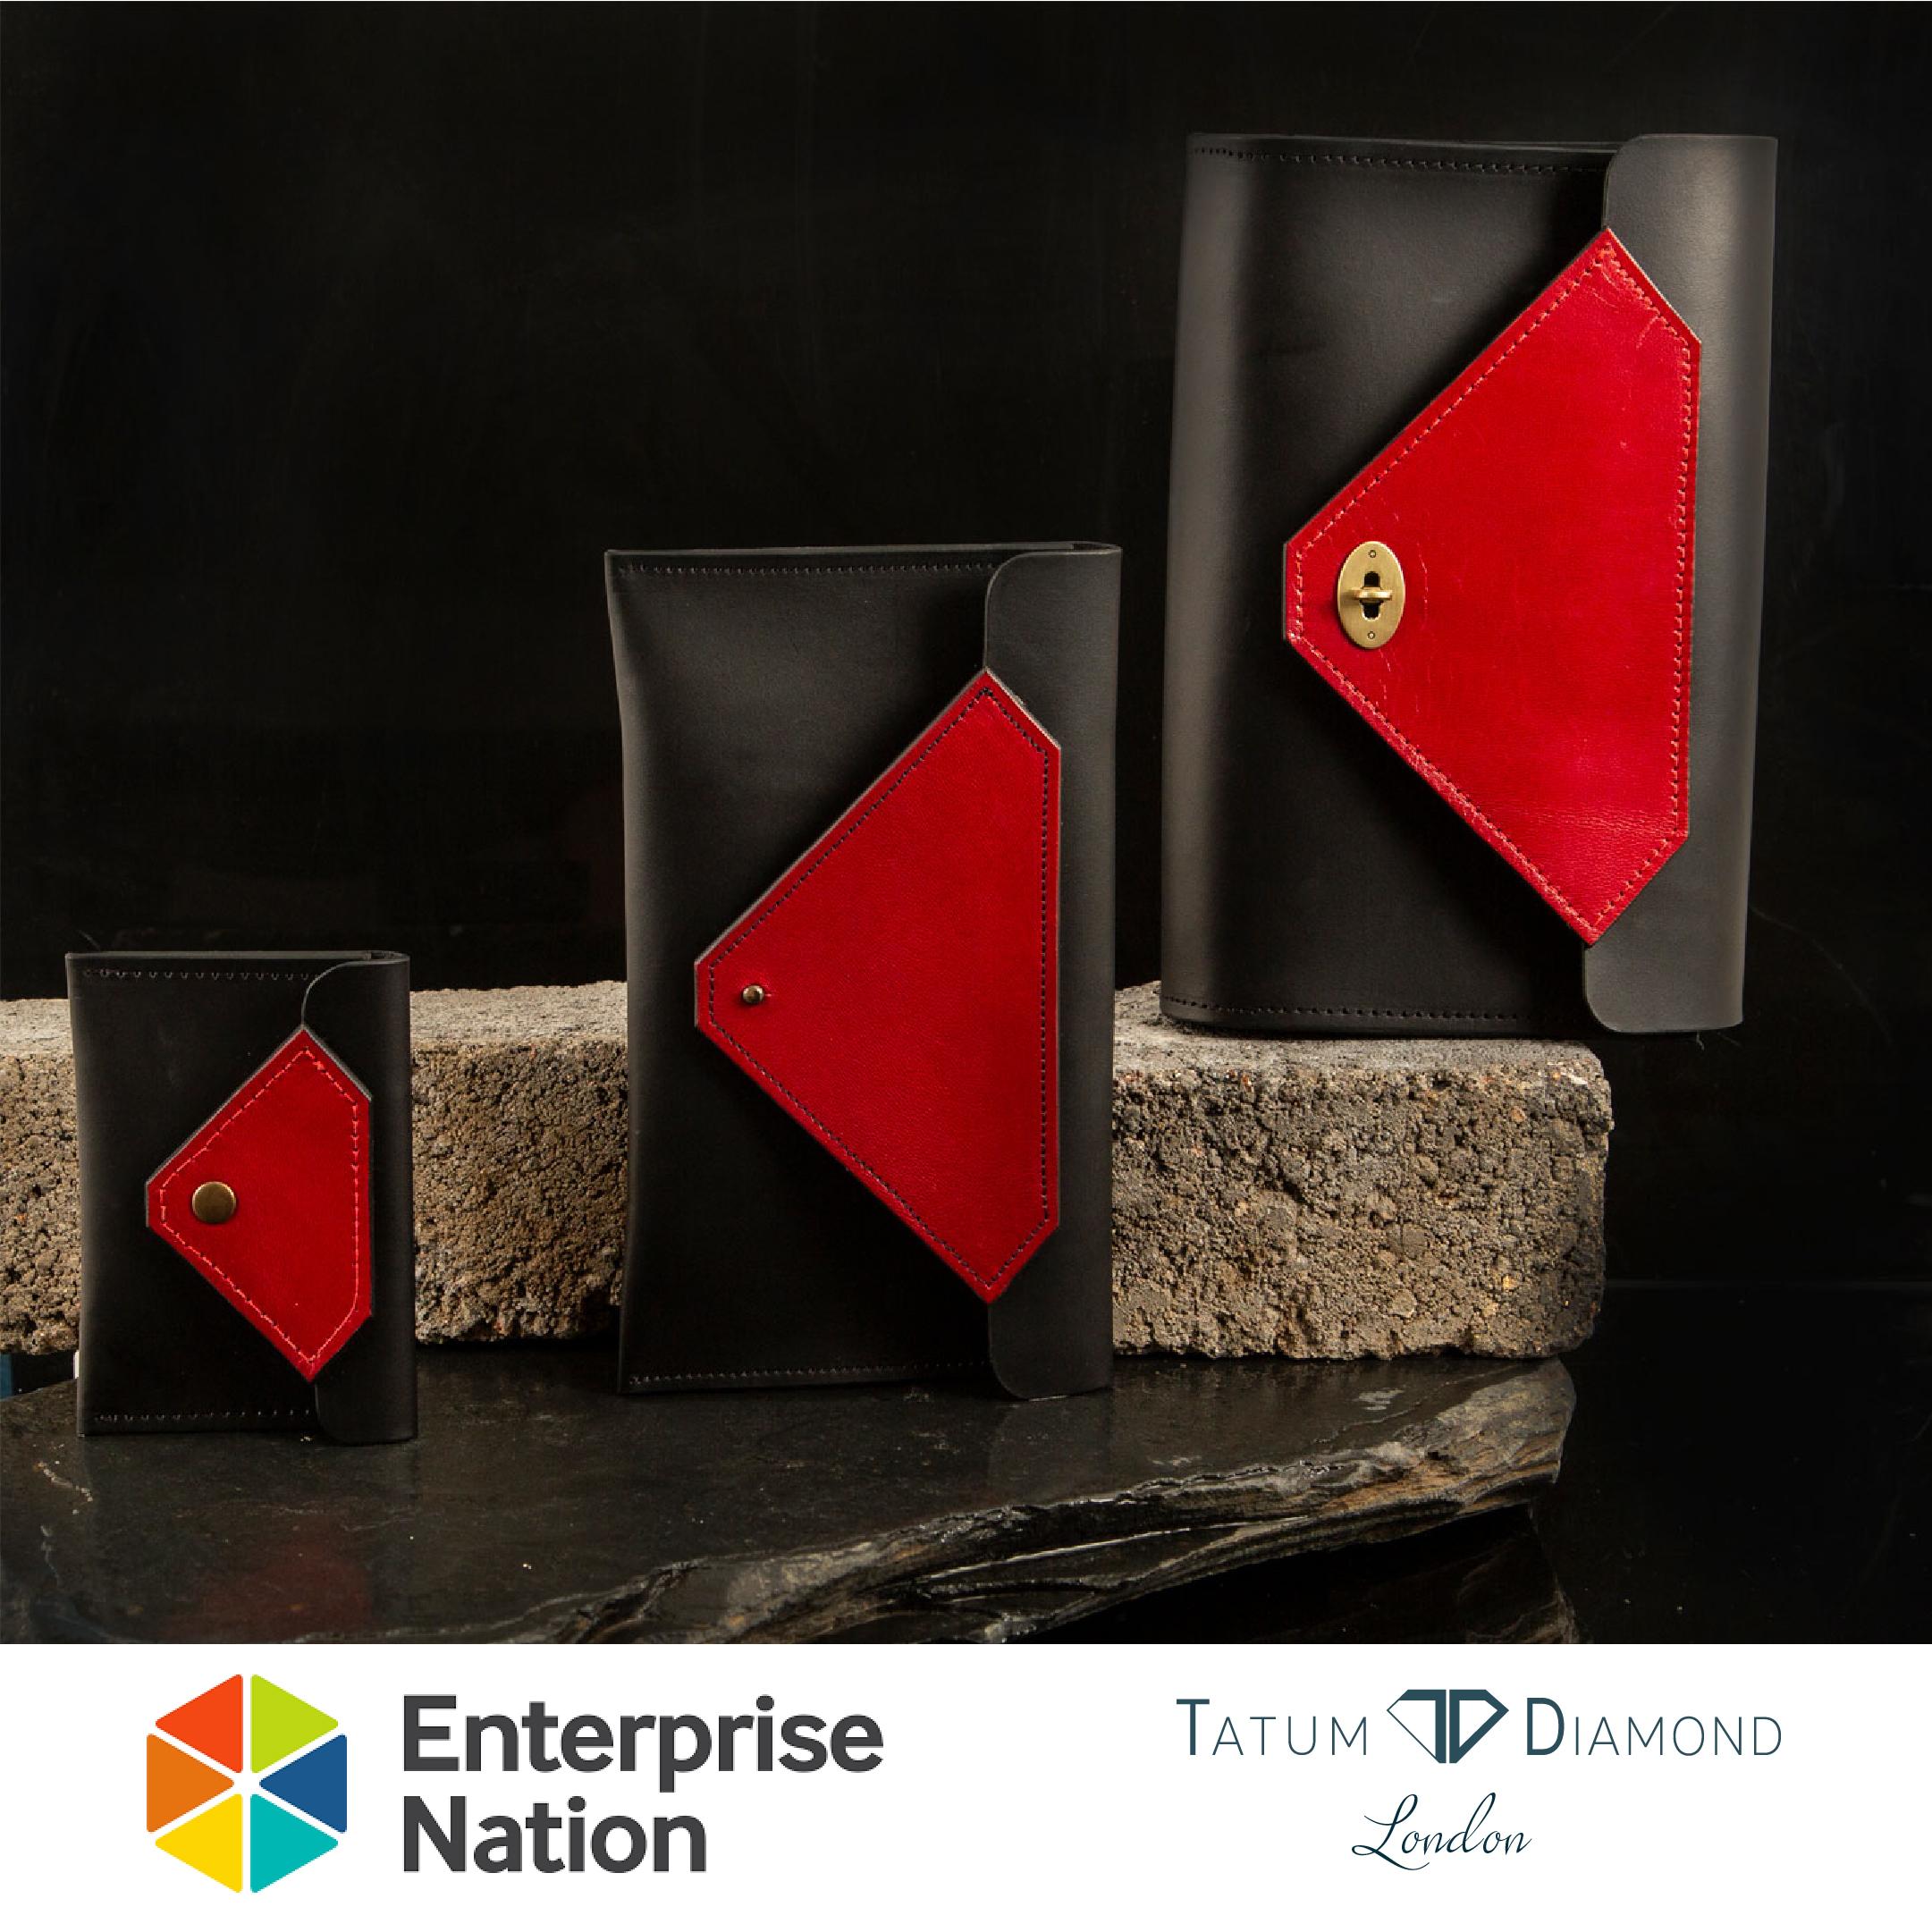 Tatum Diamond Londnon_Enterprise Nation